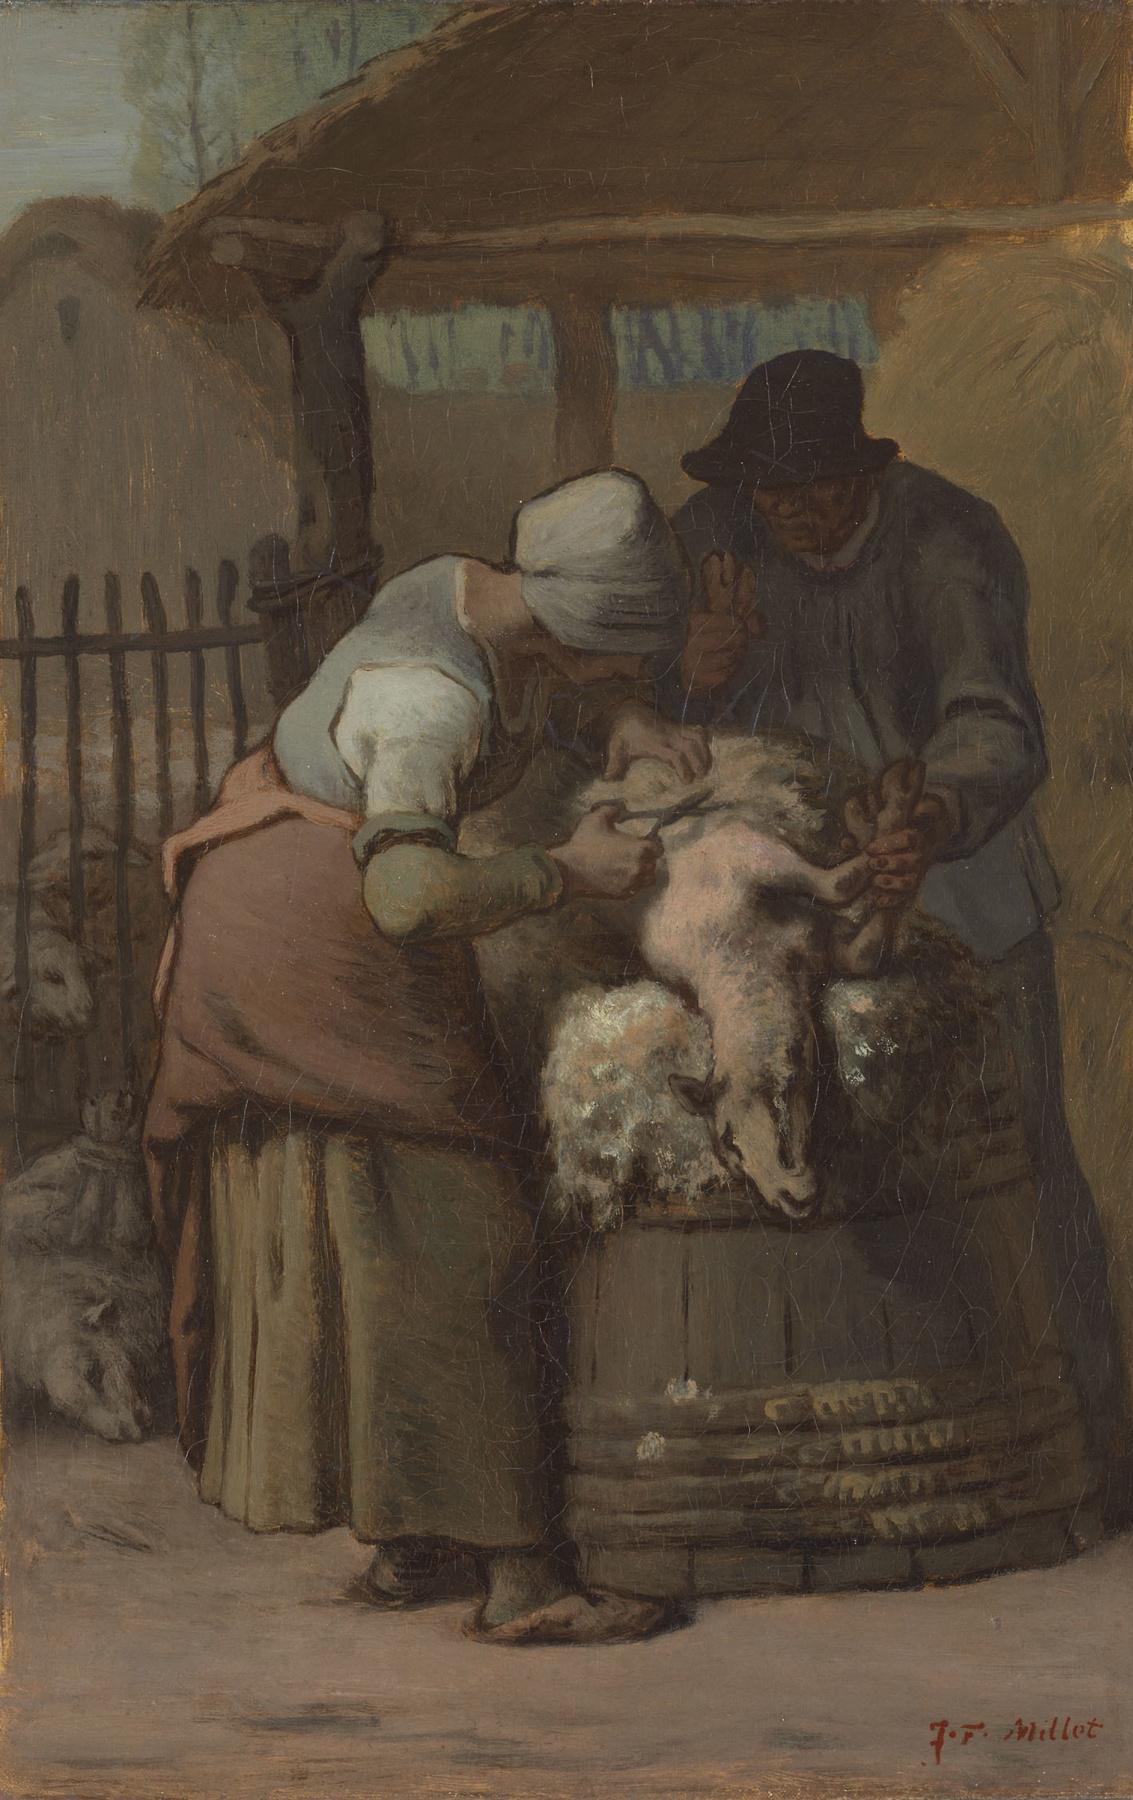 Jean-François Millet. The Sheepshearers